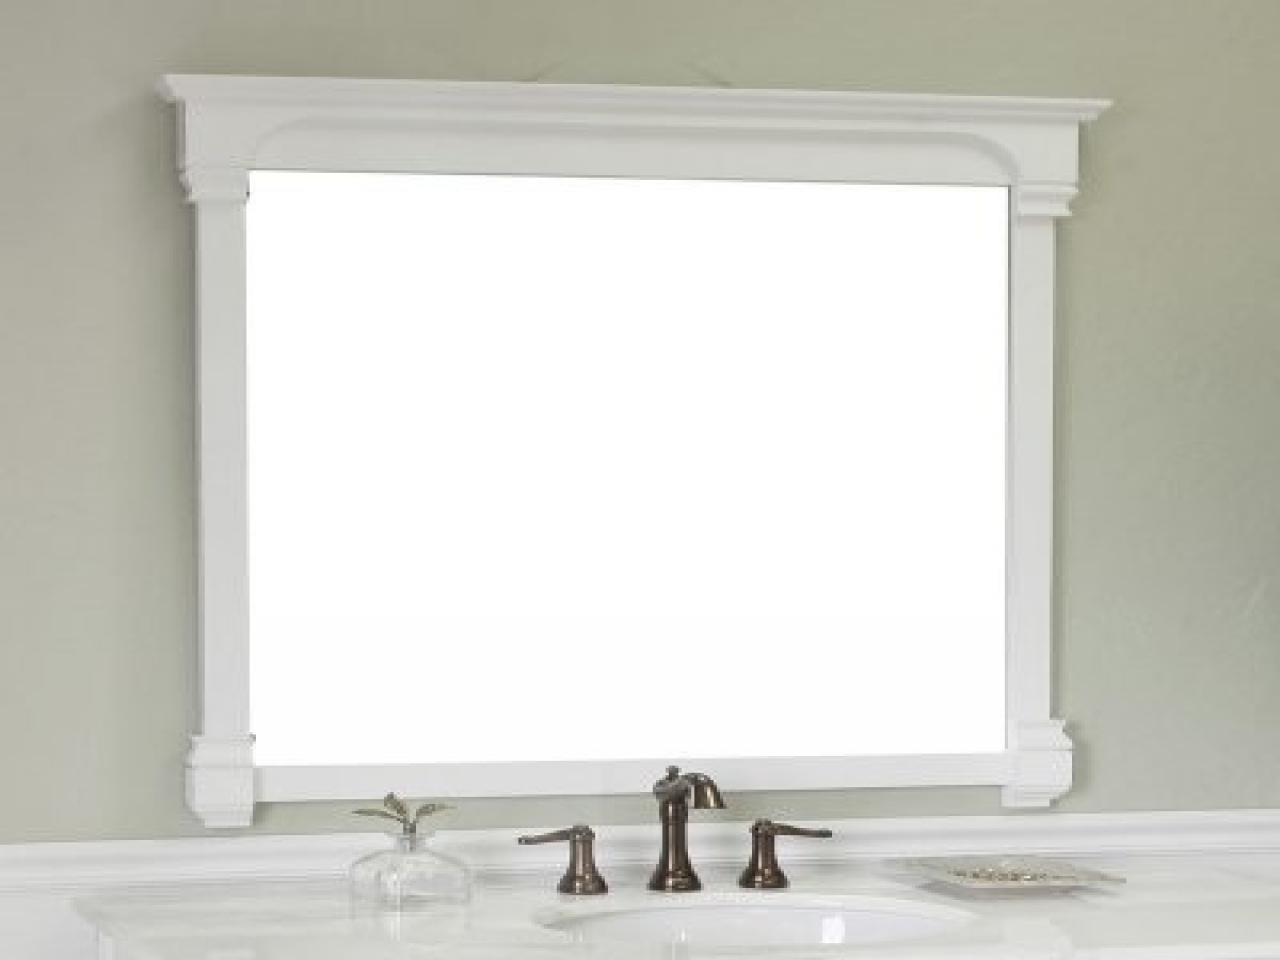 28 X 42 Bathroom Mirror